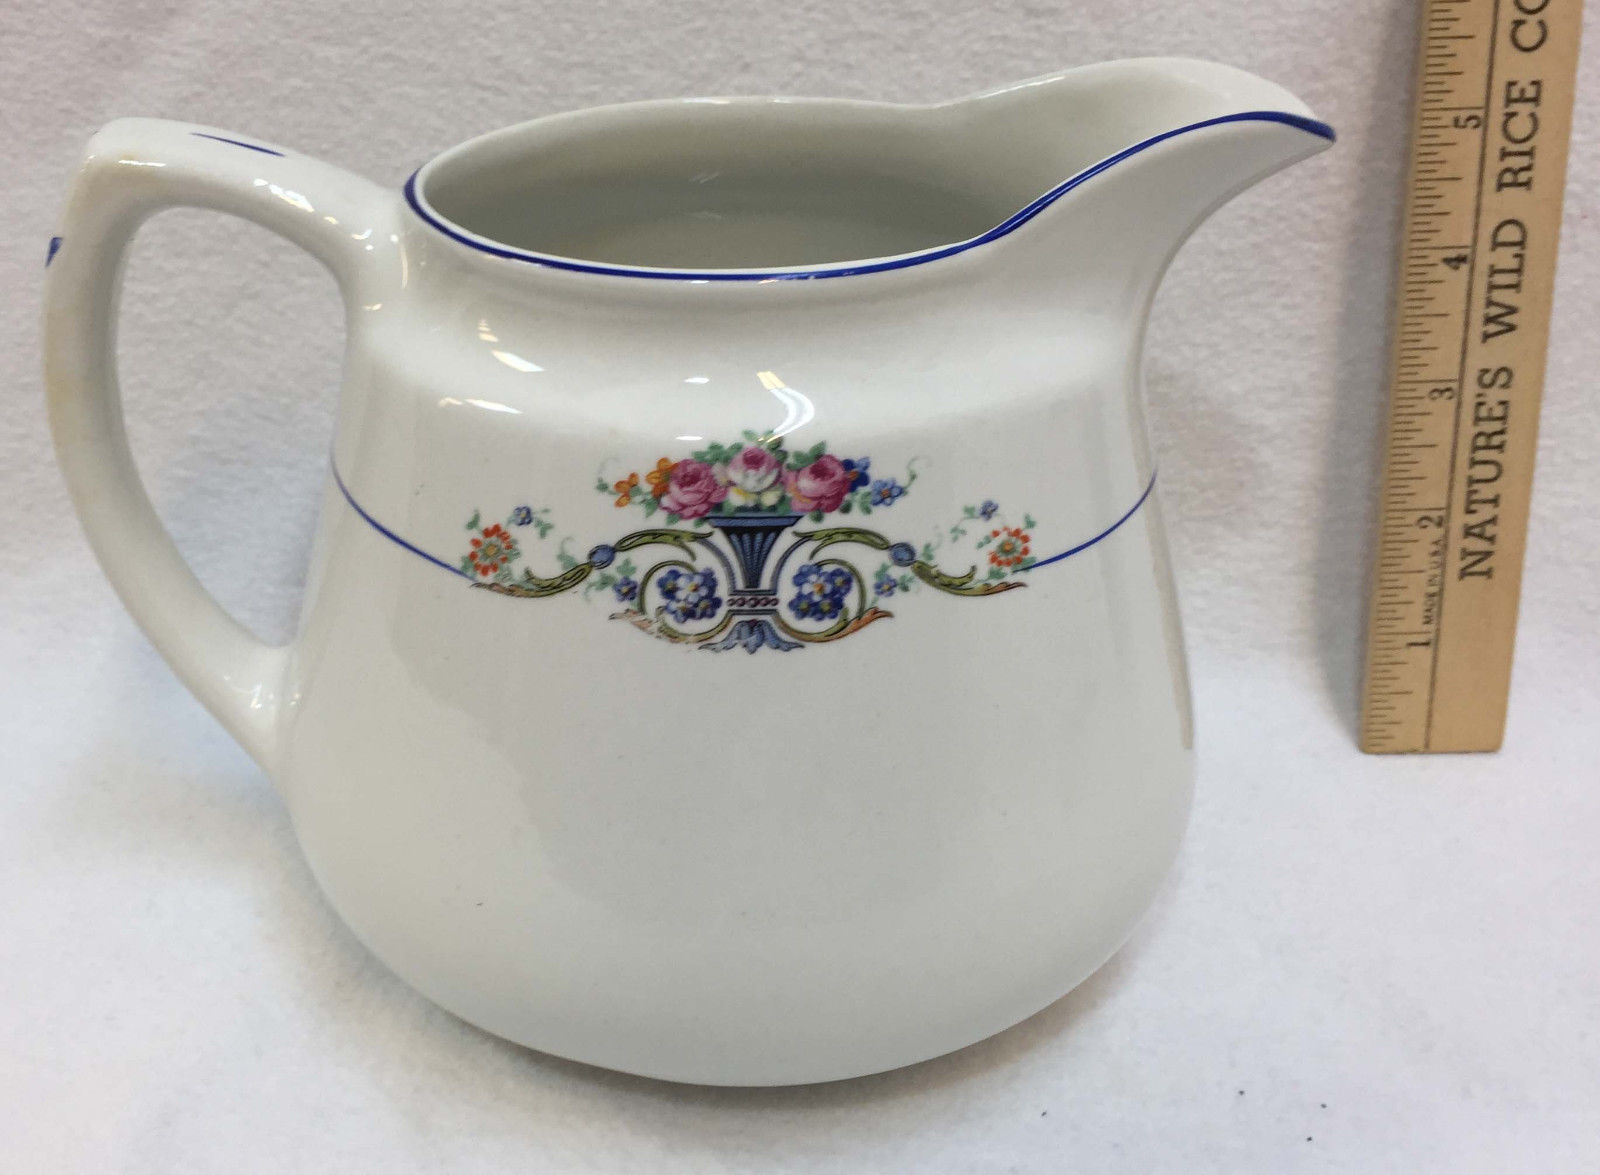 Pitcher Carrollton China White w/ Floral Flower Design Cobalt Blue Trim Vintage